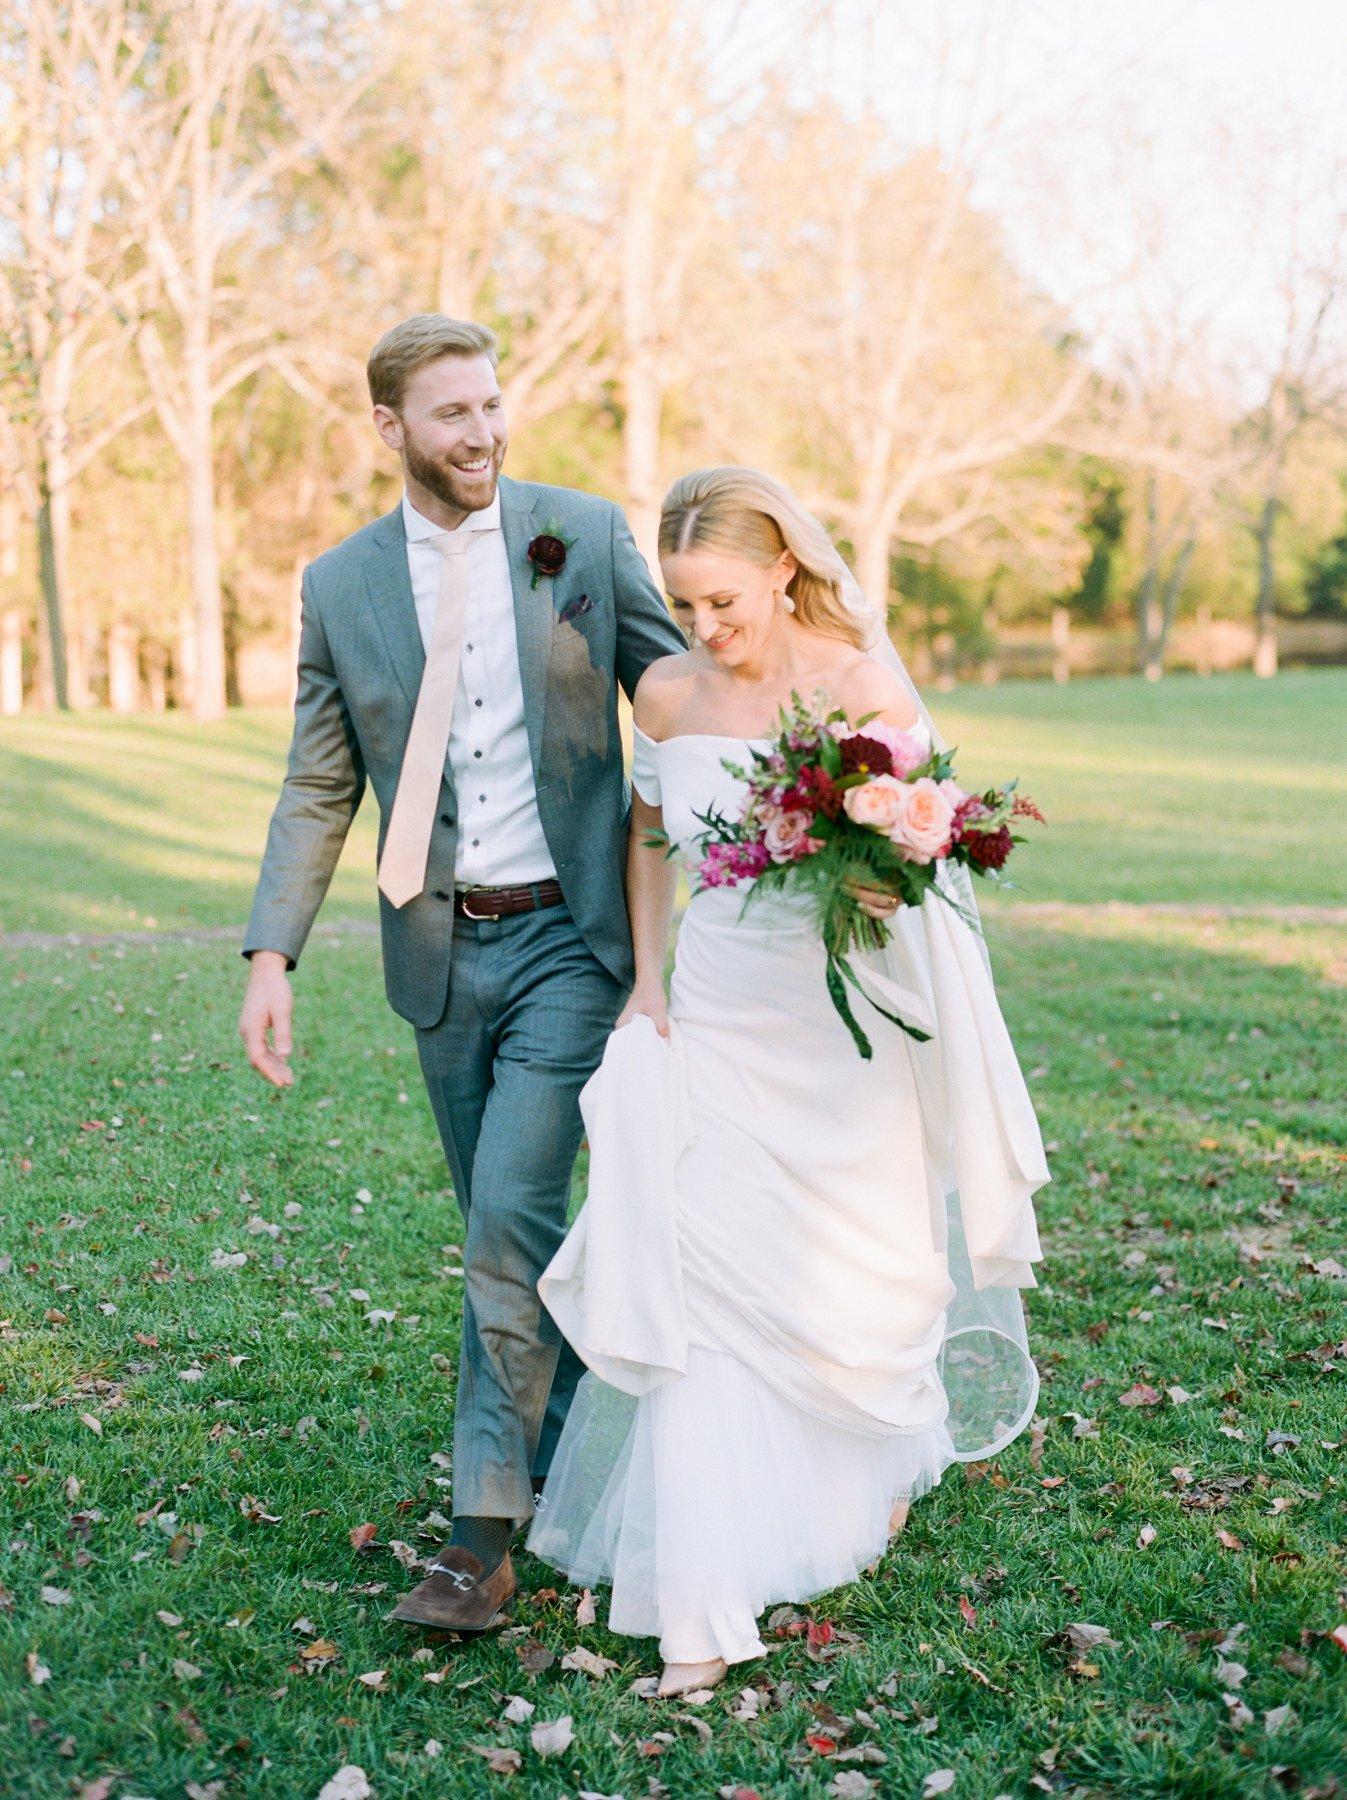 52Great_Marsh_Estates_Wedding_Anne_Kelley_Events_Astrid_Photography146486060009-2